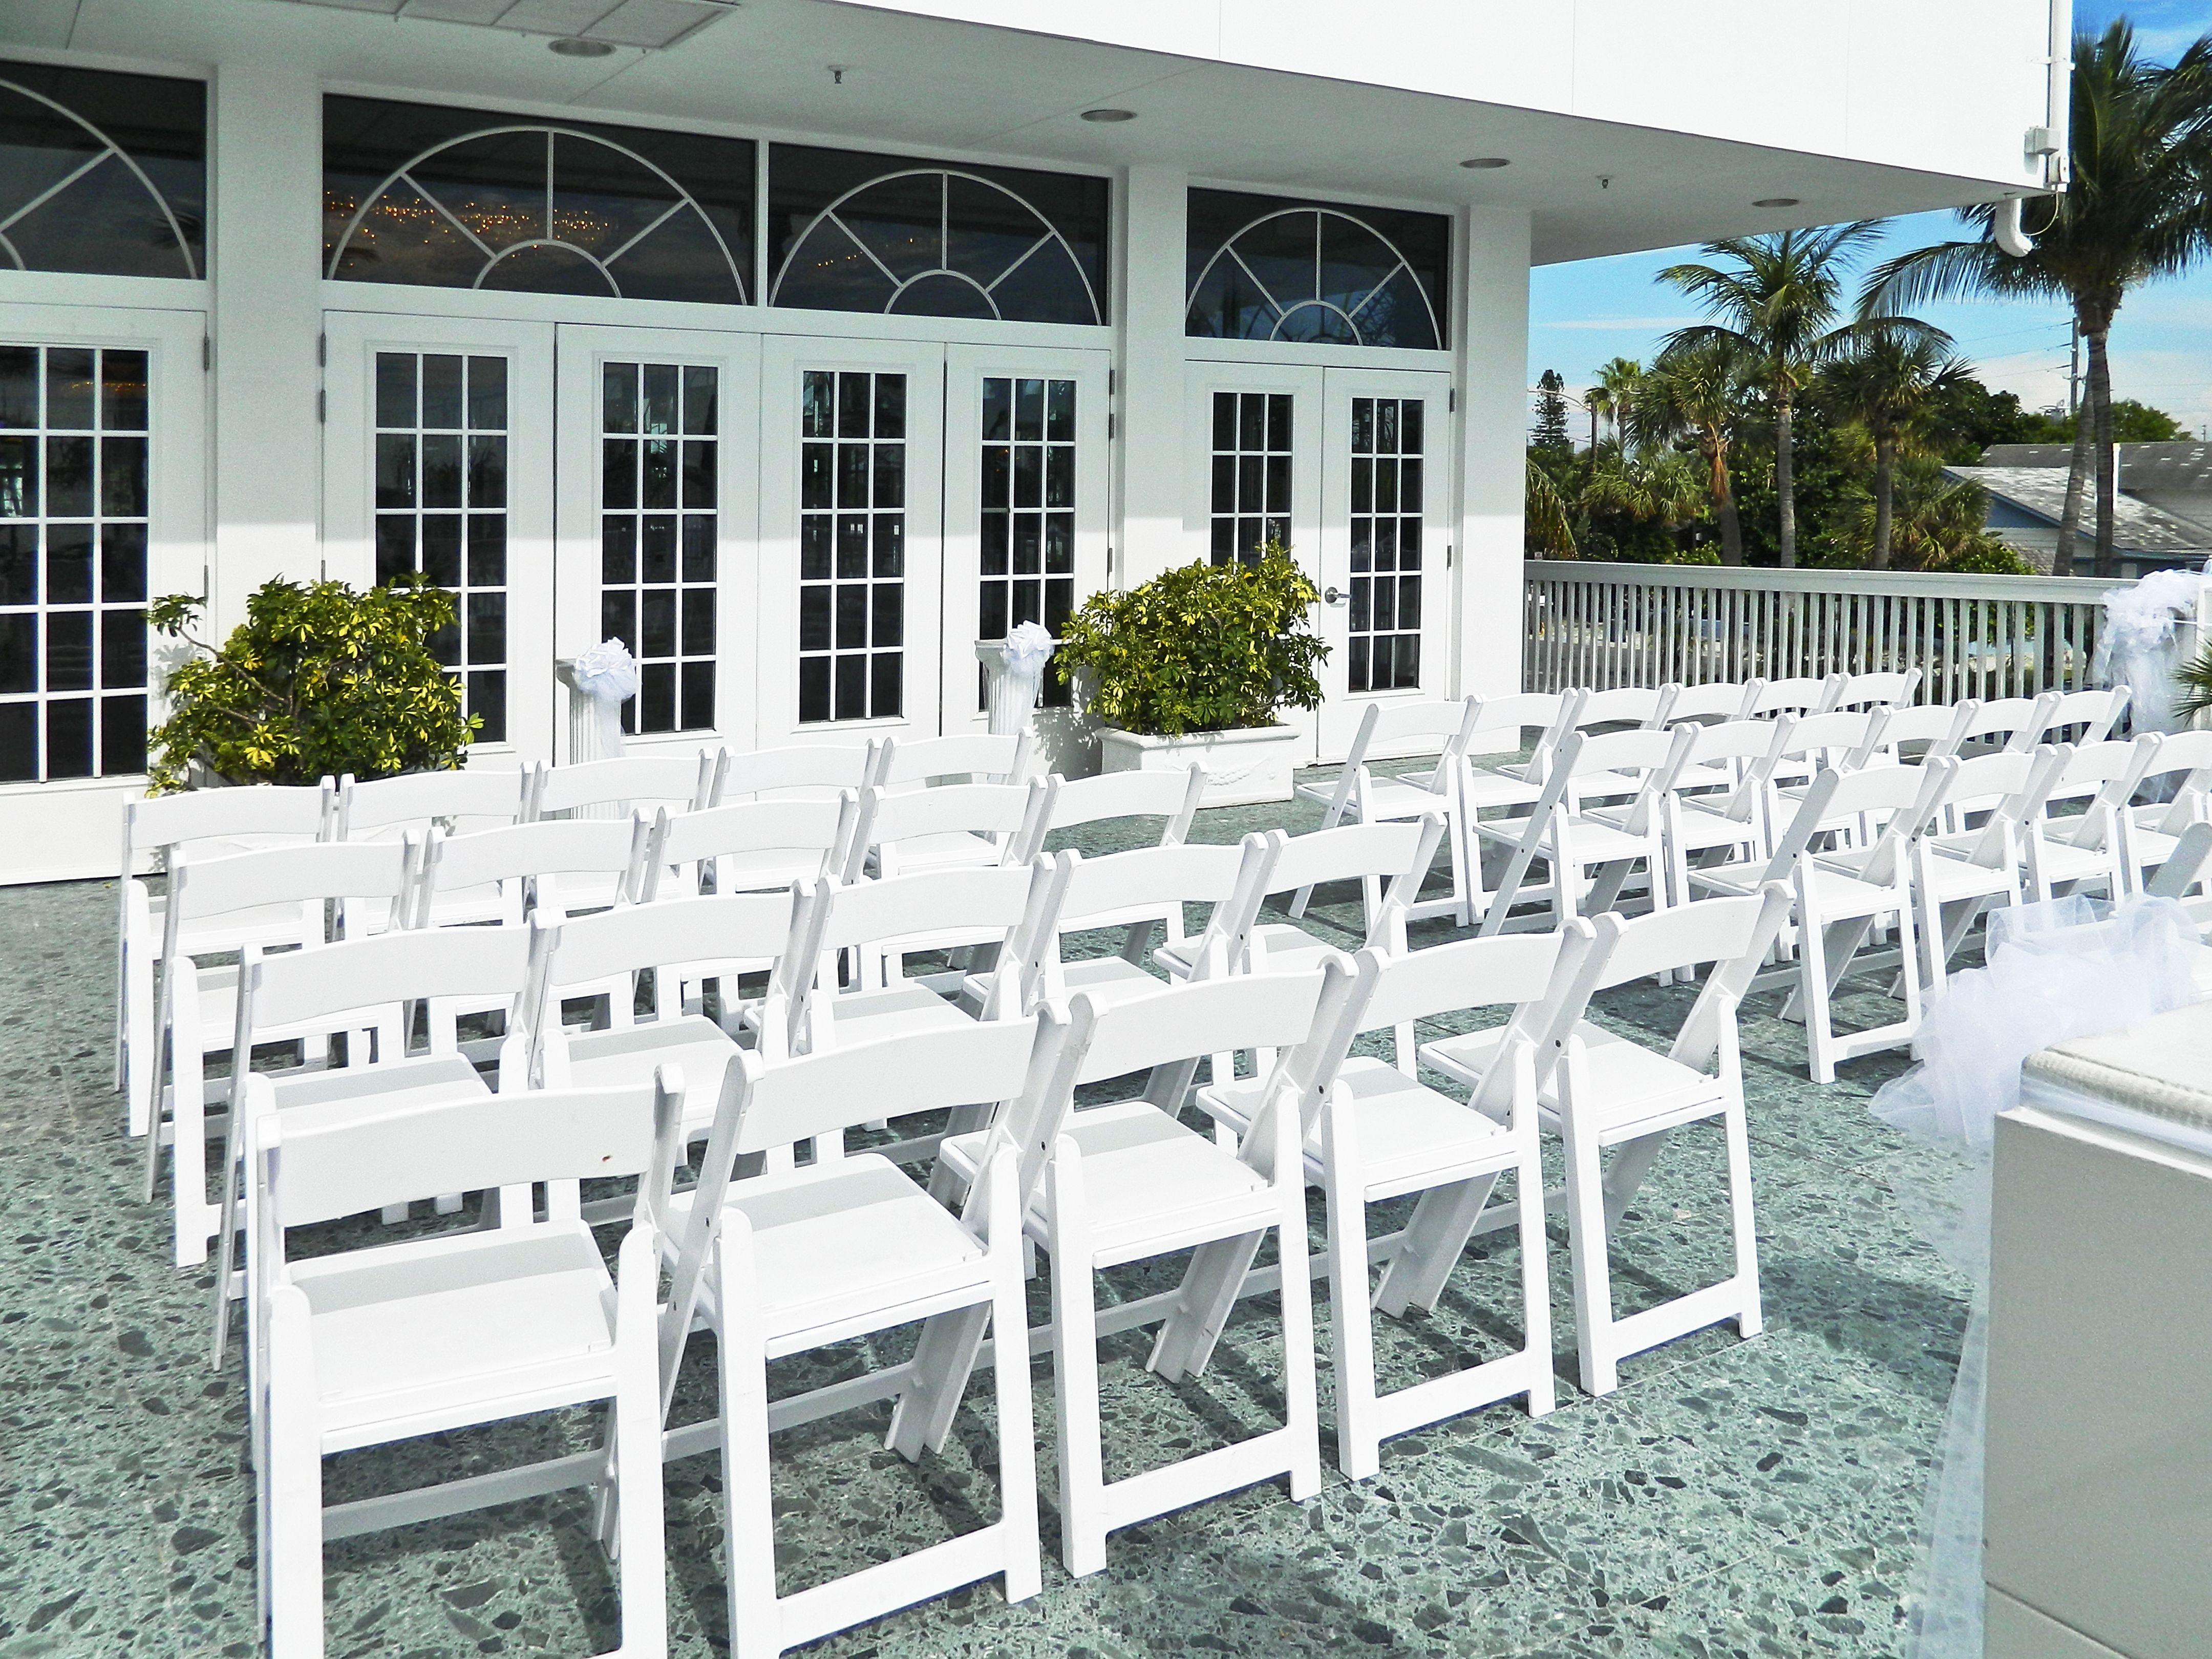 Wedding Ceremony on Patio/deck. Imperial Ballroom. Grand